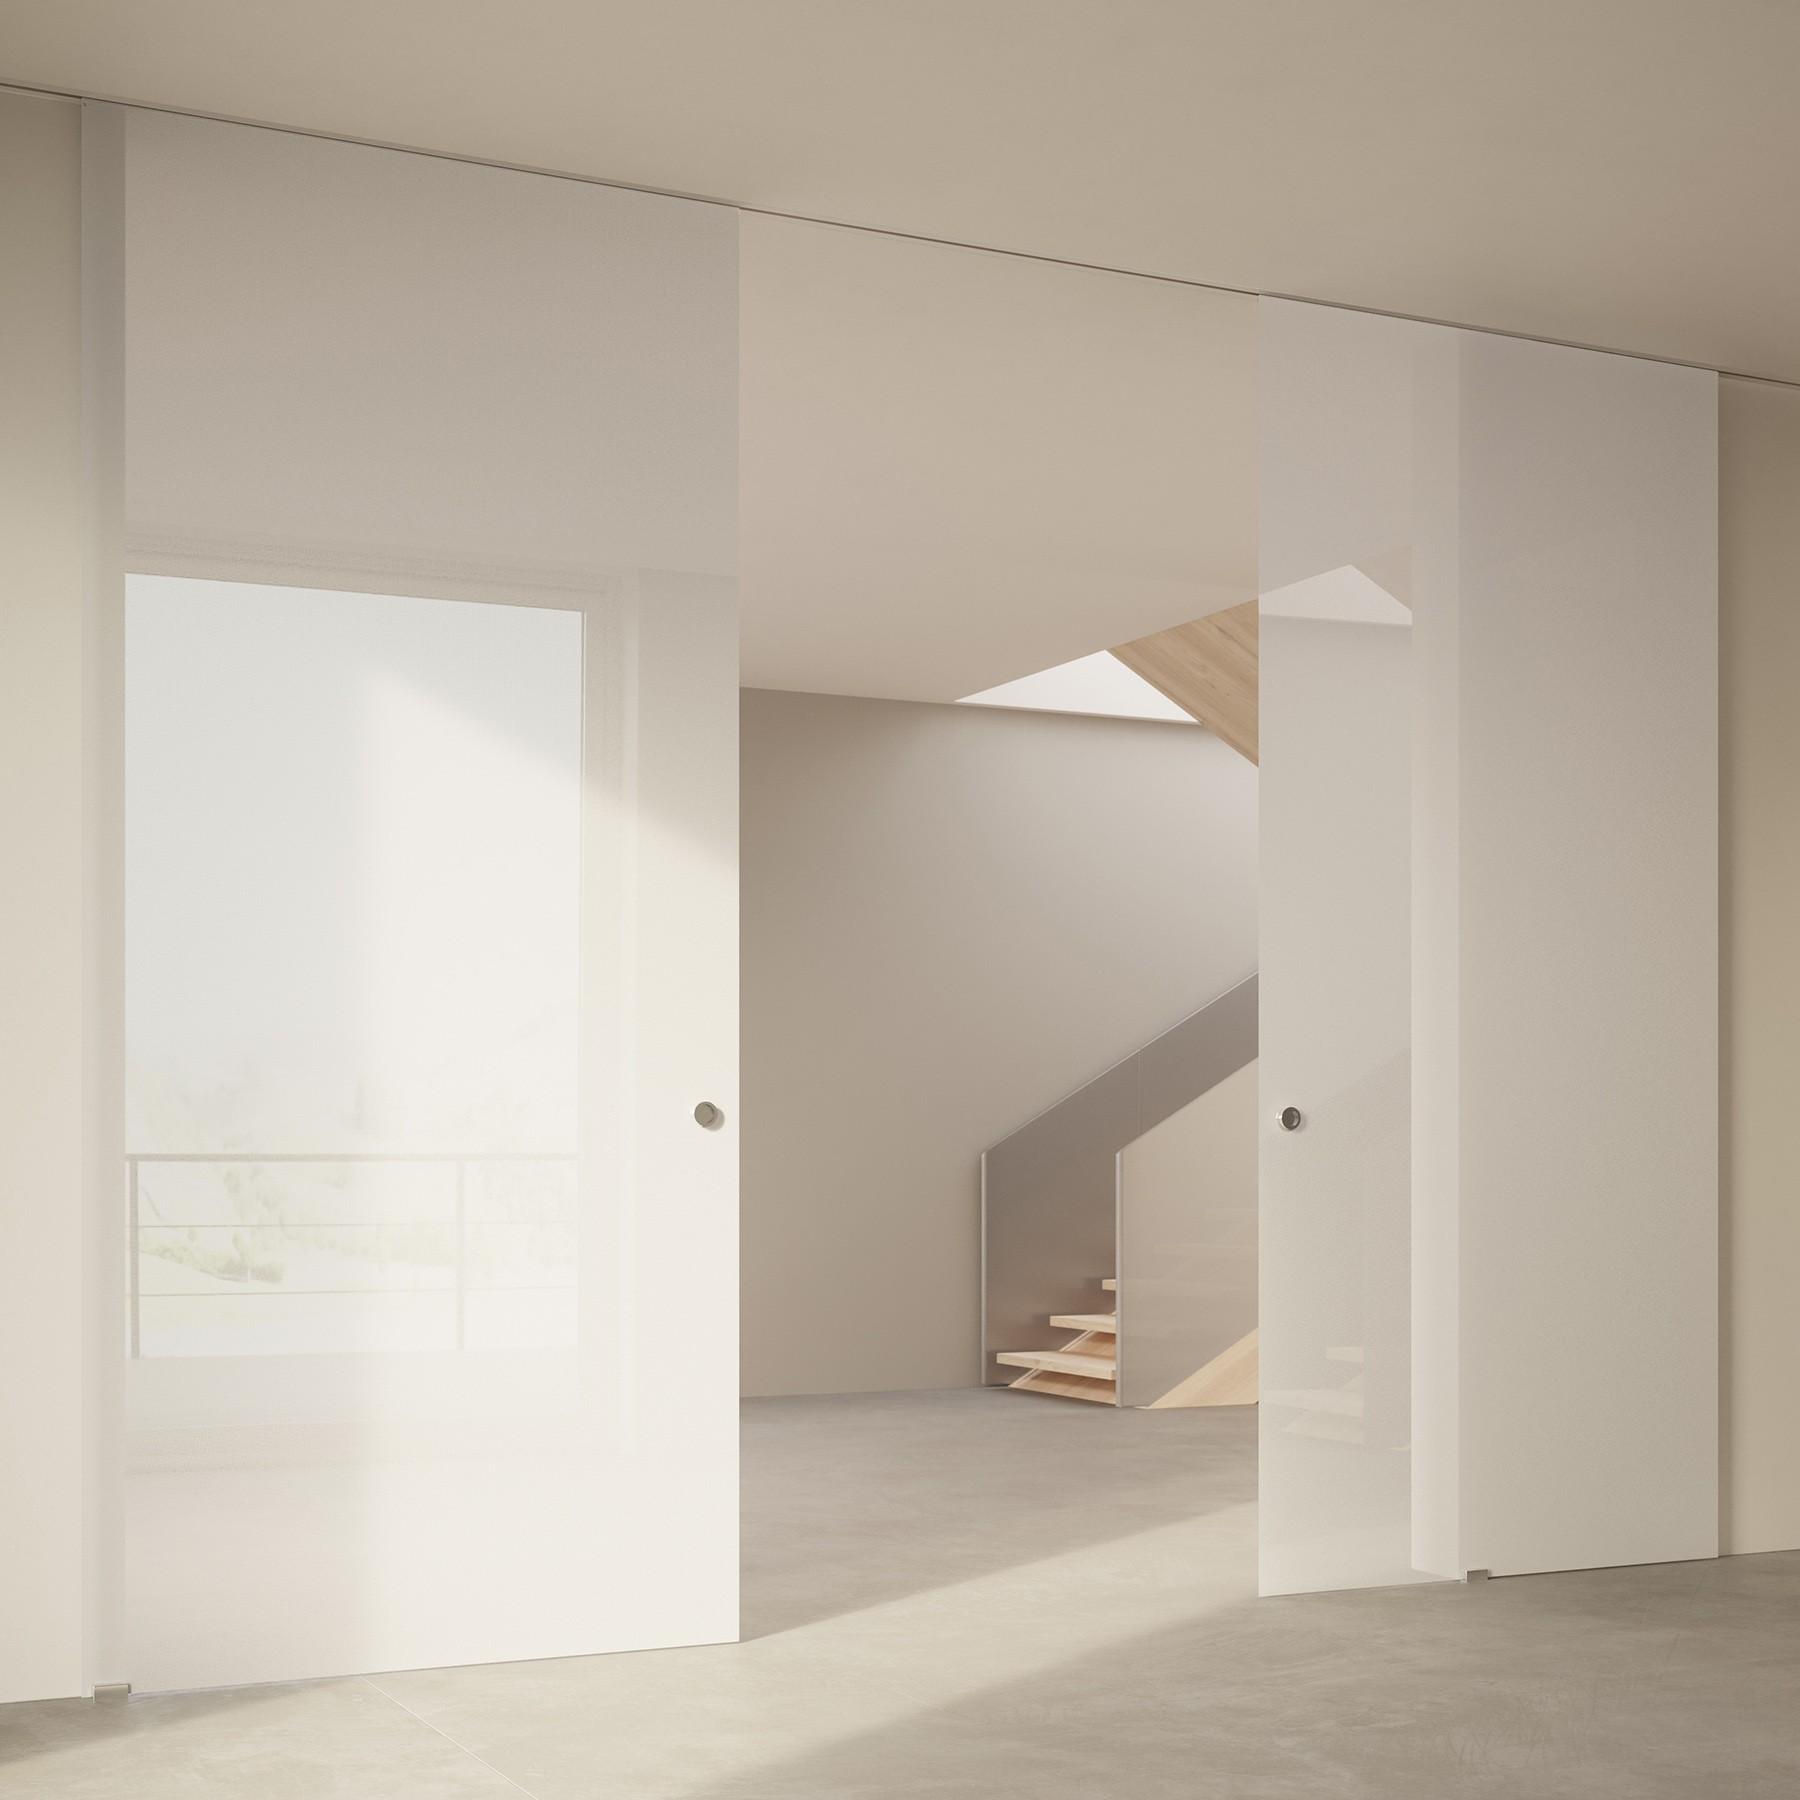 Scenario Visio Up with Textil Extrachiaro Bianco glass